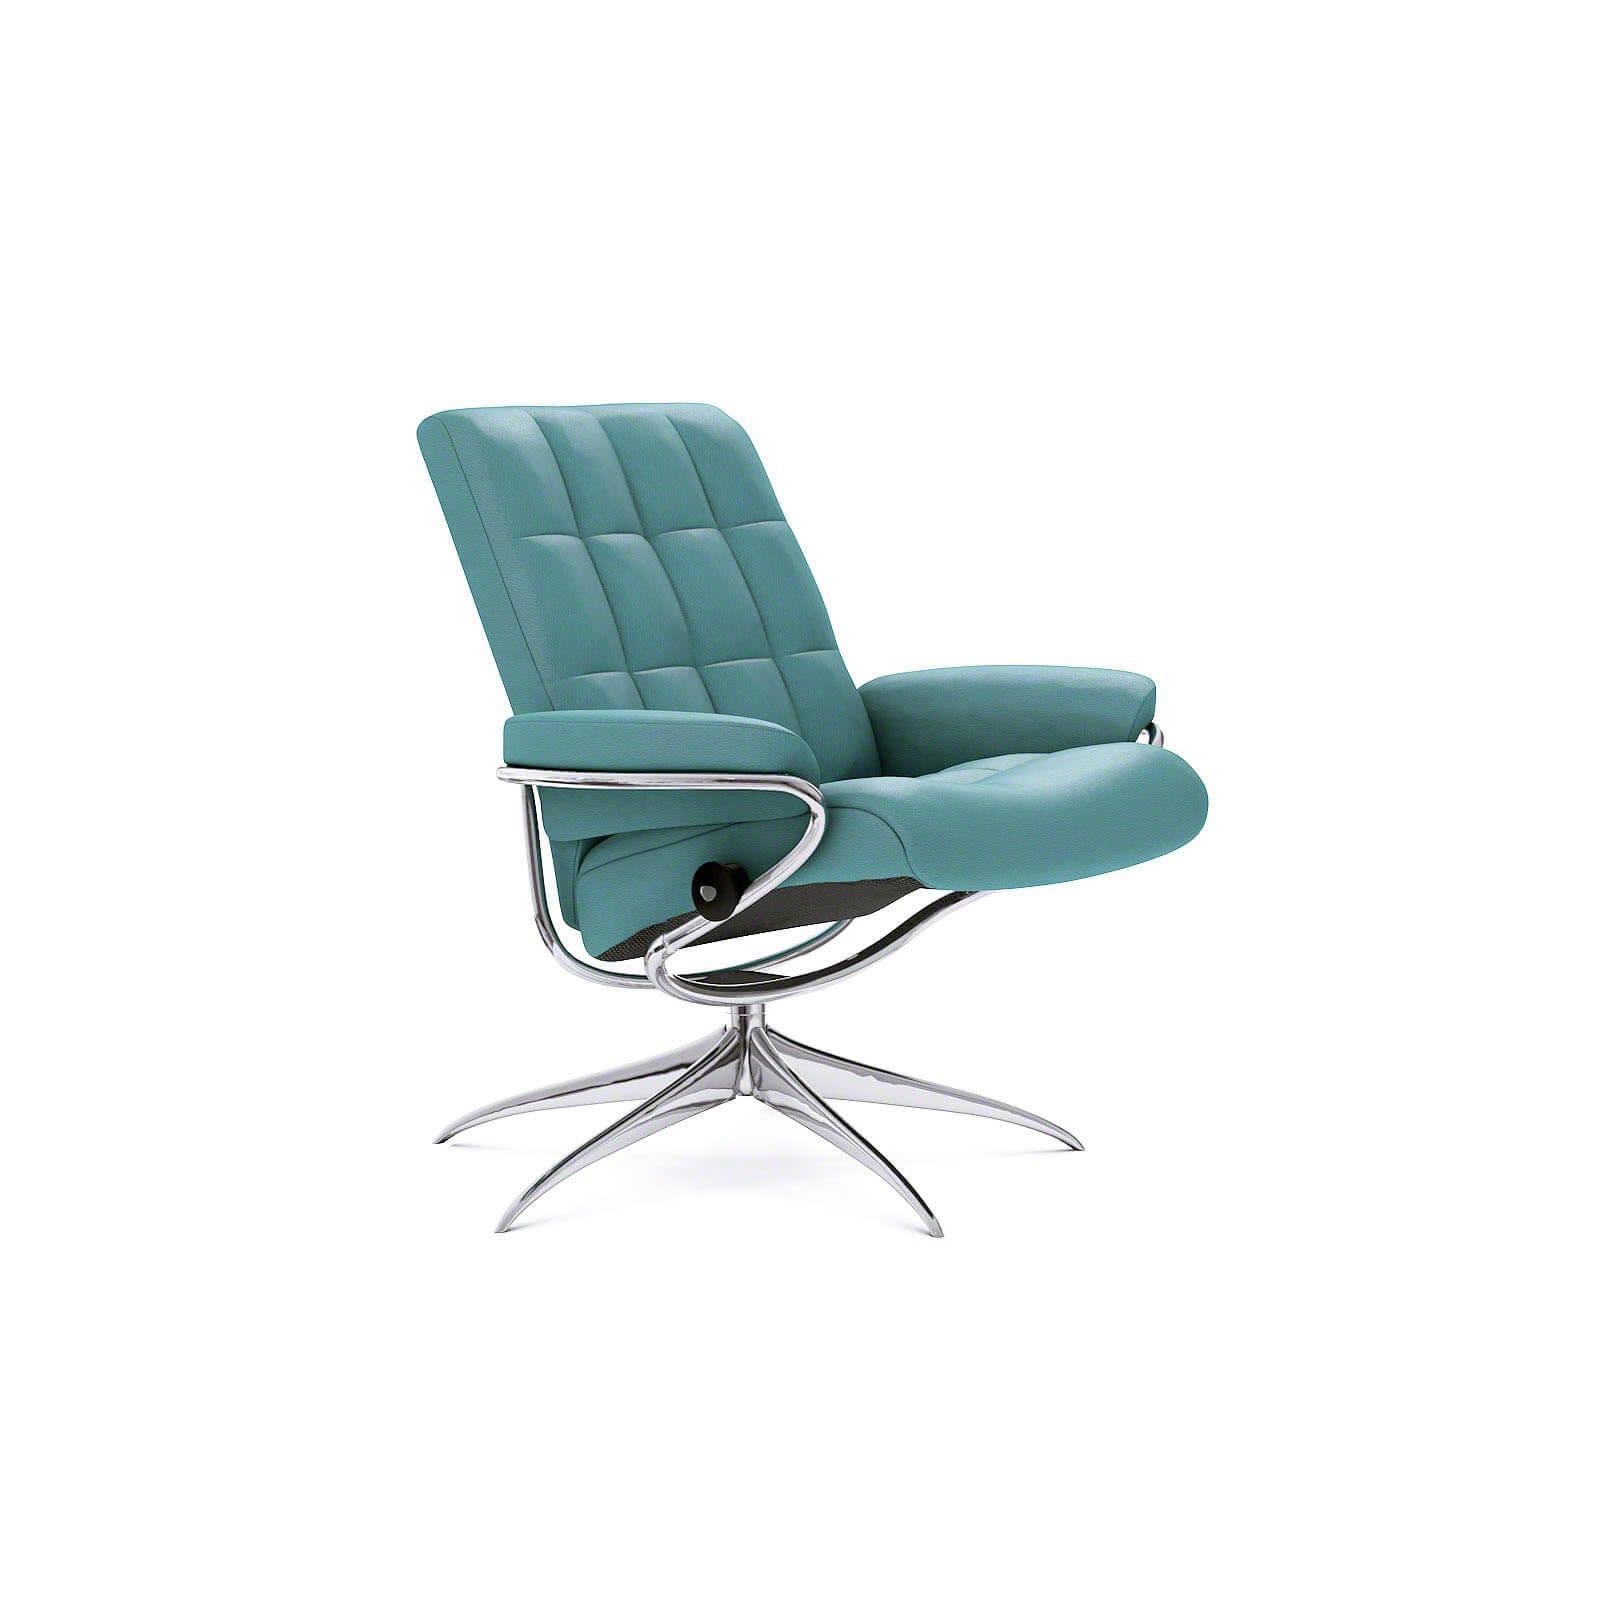 stressless london mit niedriger lehne lederfarbe aqua green. Black Bedroom Furniture Sets. Home Design Ideas